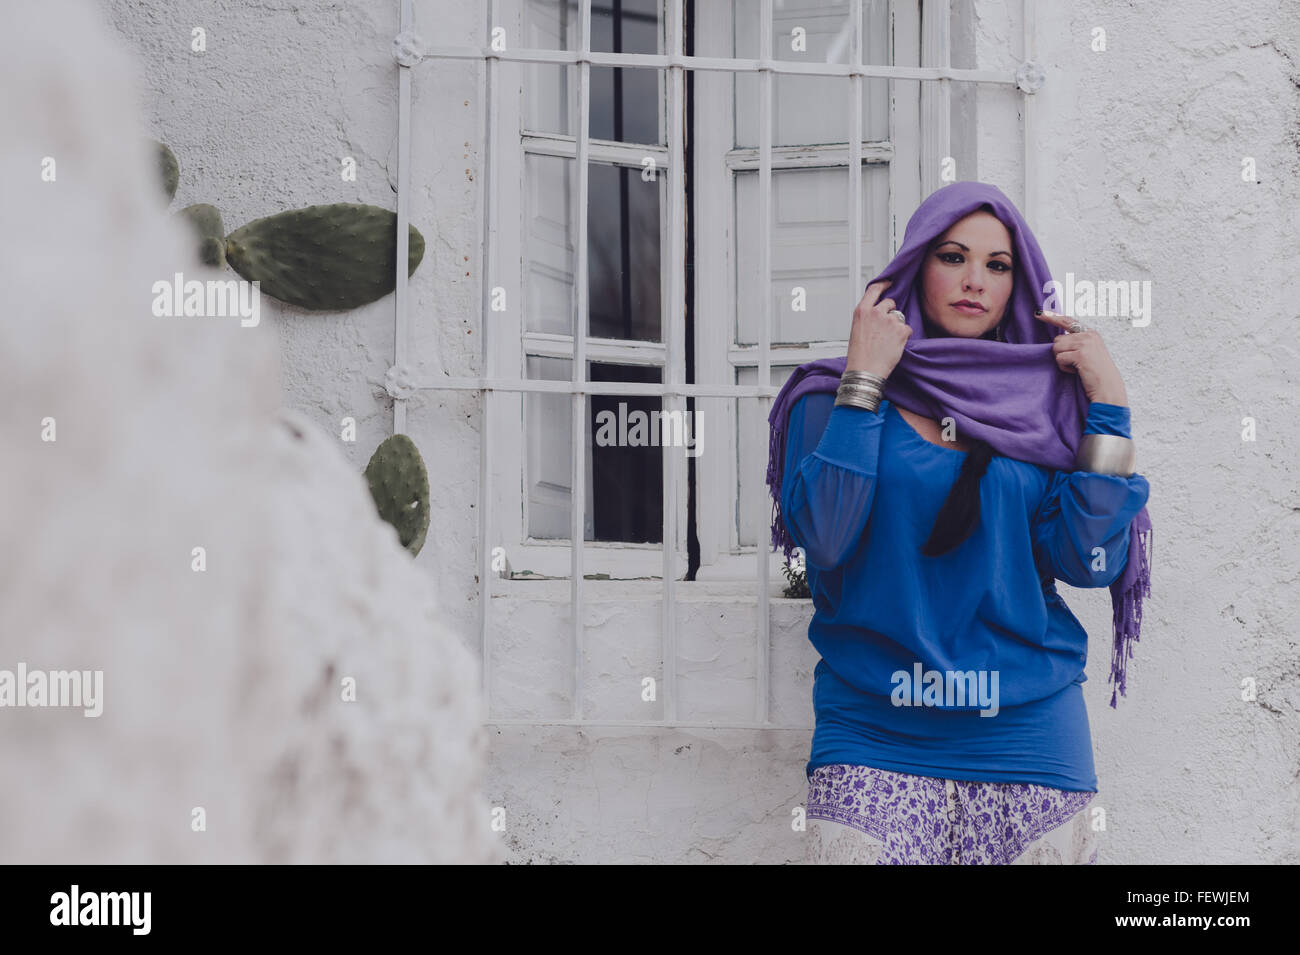 Woman Wearing Headscarf - Stock Image